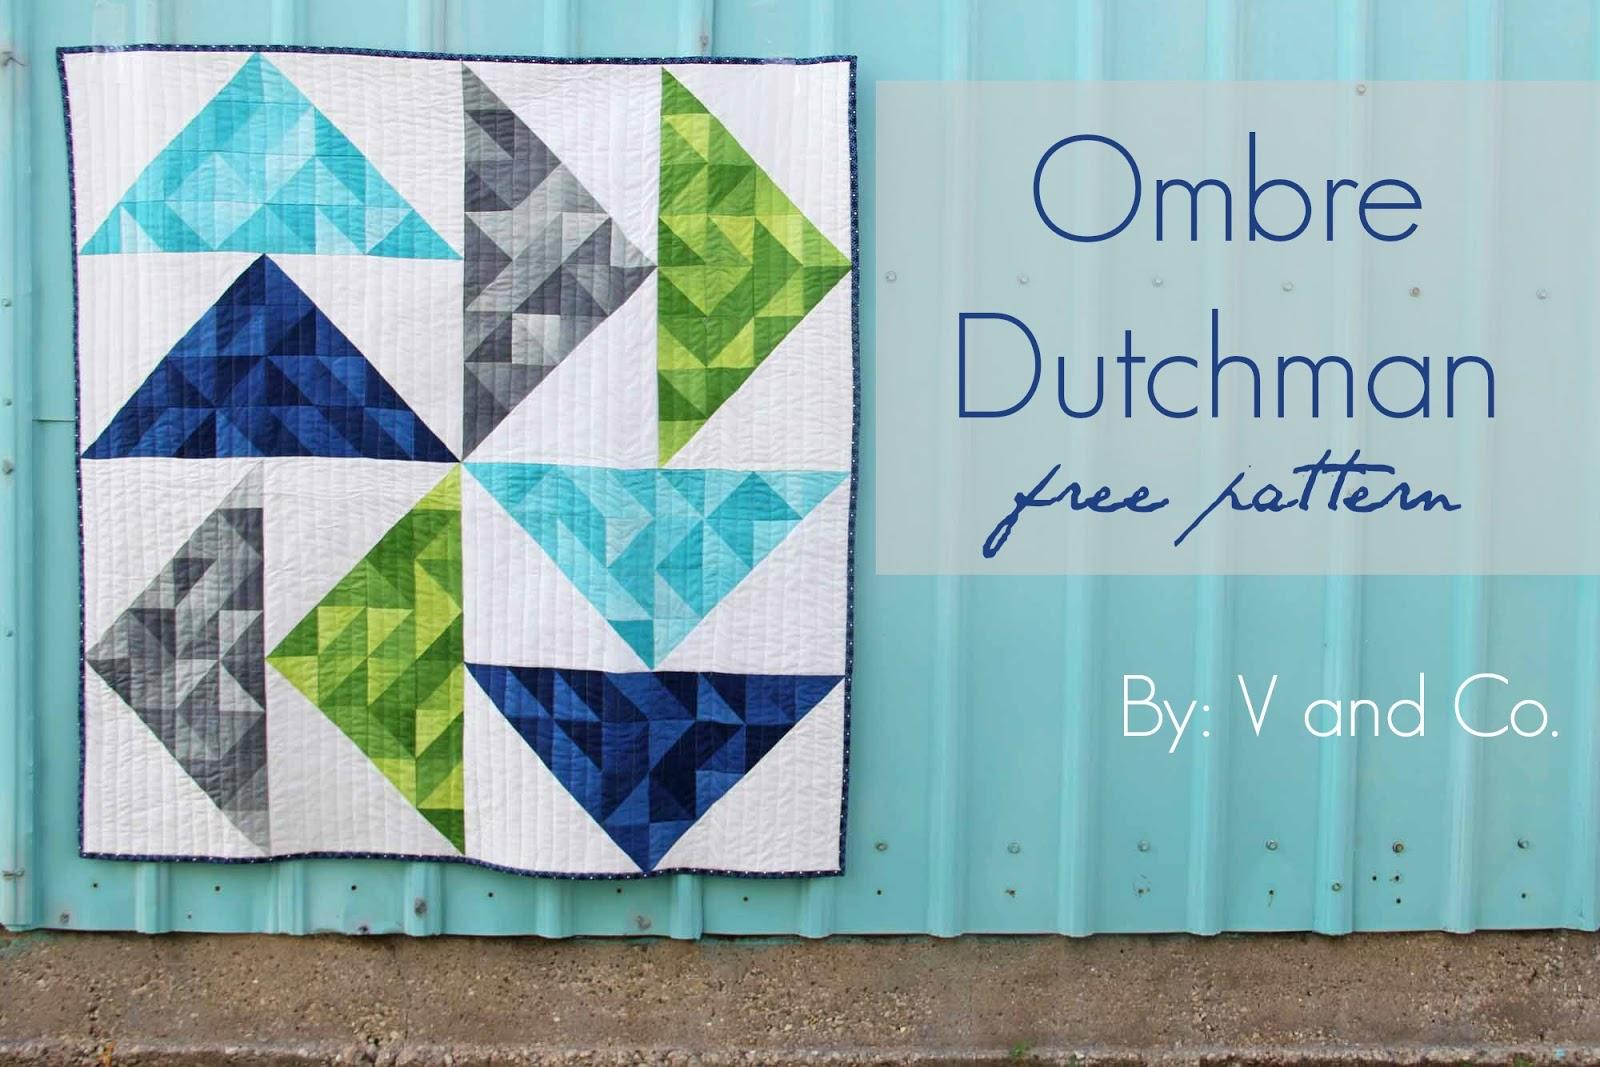 V and Co.: V and Co: how to make: ombre dutchman free quilt pattern : flying dutchman quilt pattern - Adamdwight.com